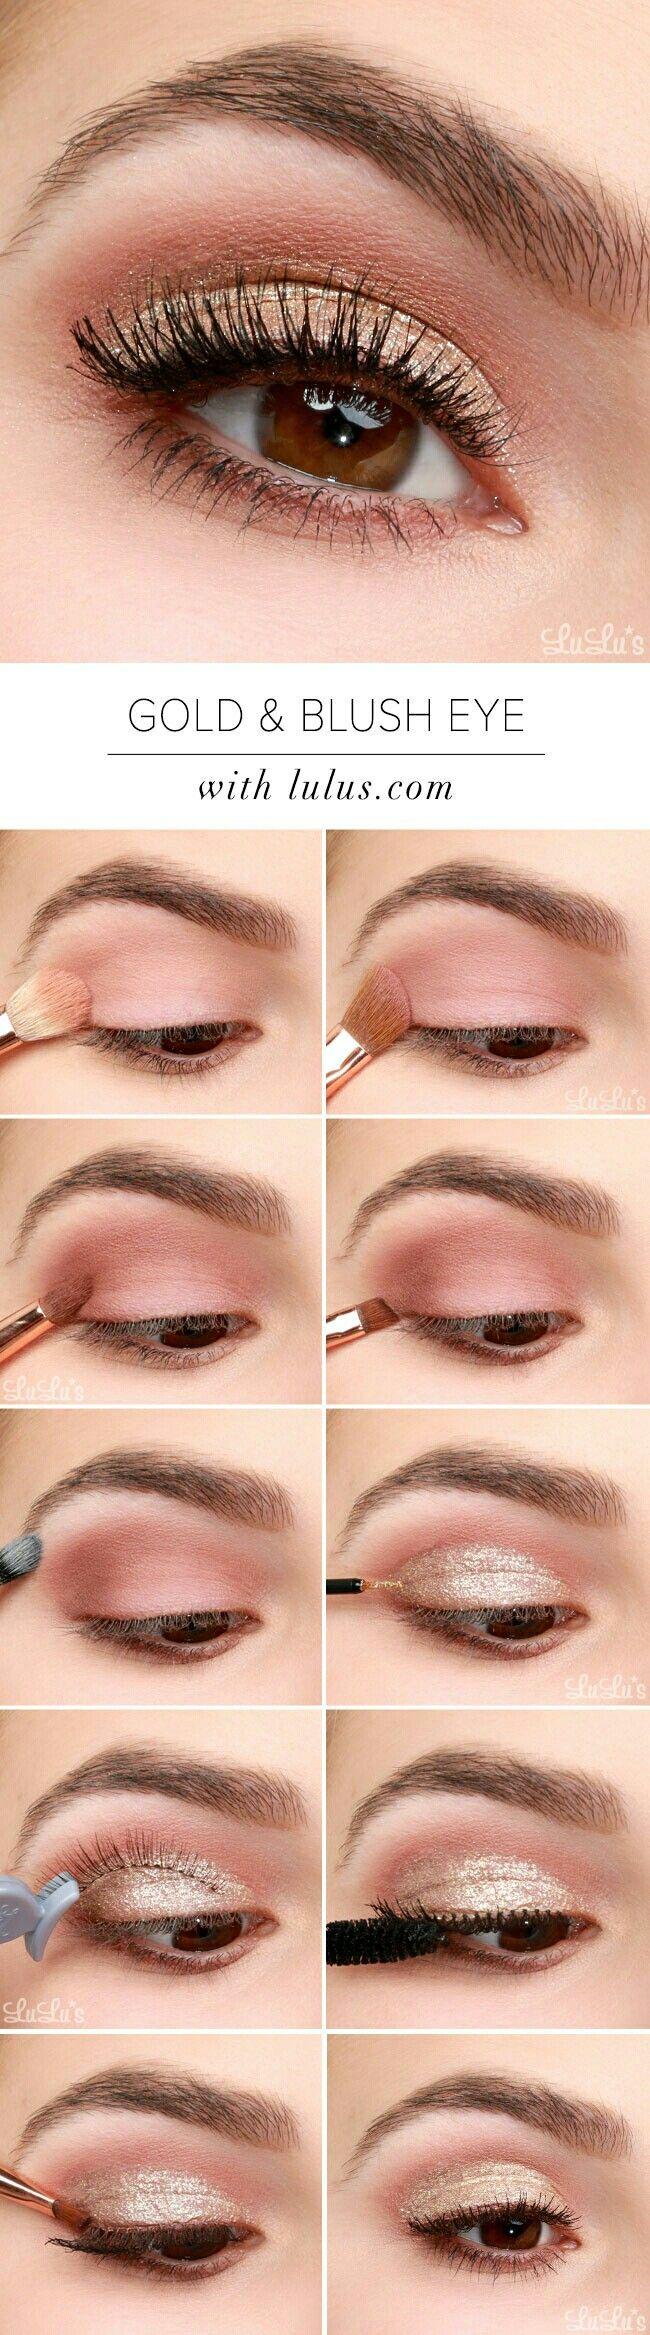 Gold & blush eye